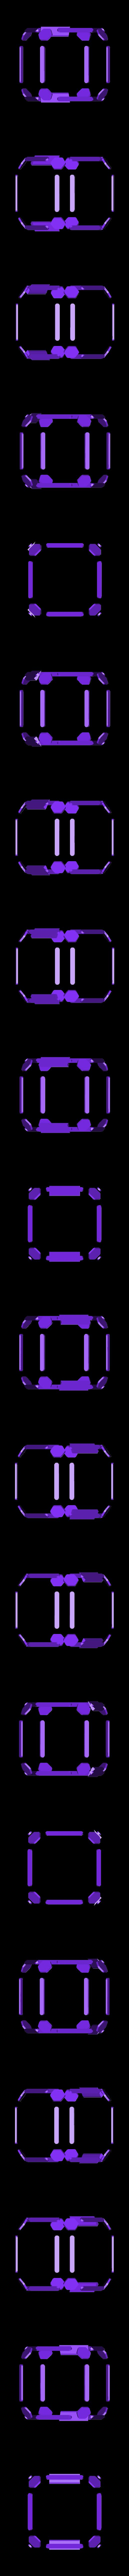 ttc-box-B.stl Download free STL file Time Tracking Cube • 3D print design, Adafruit